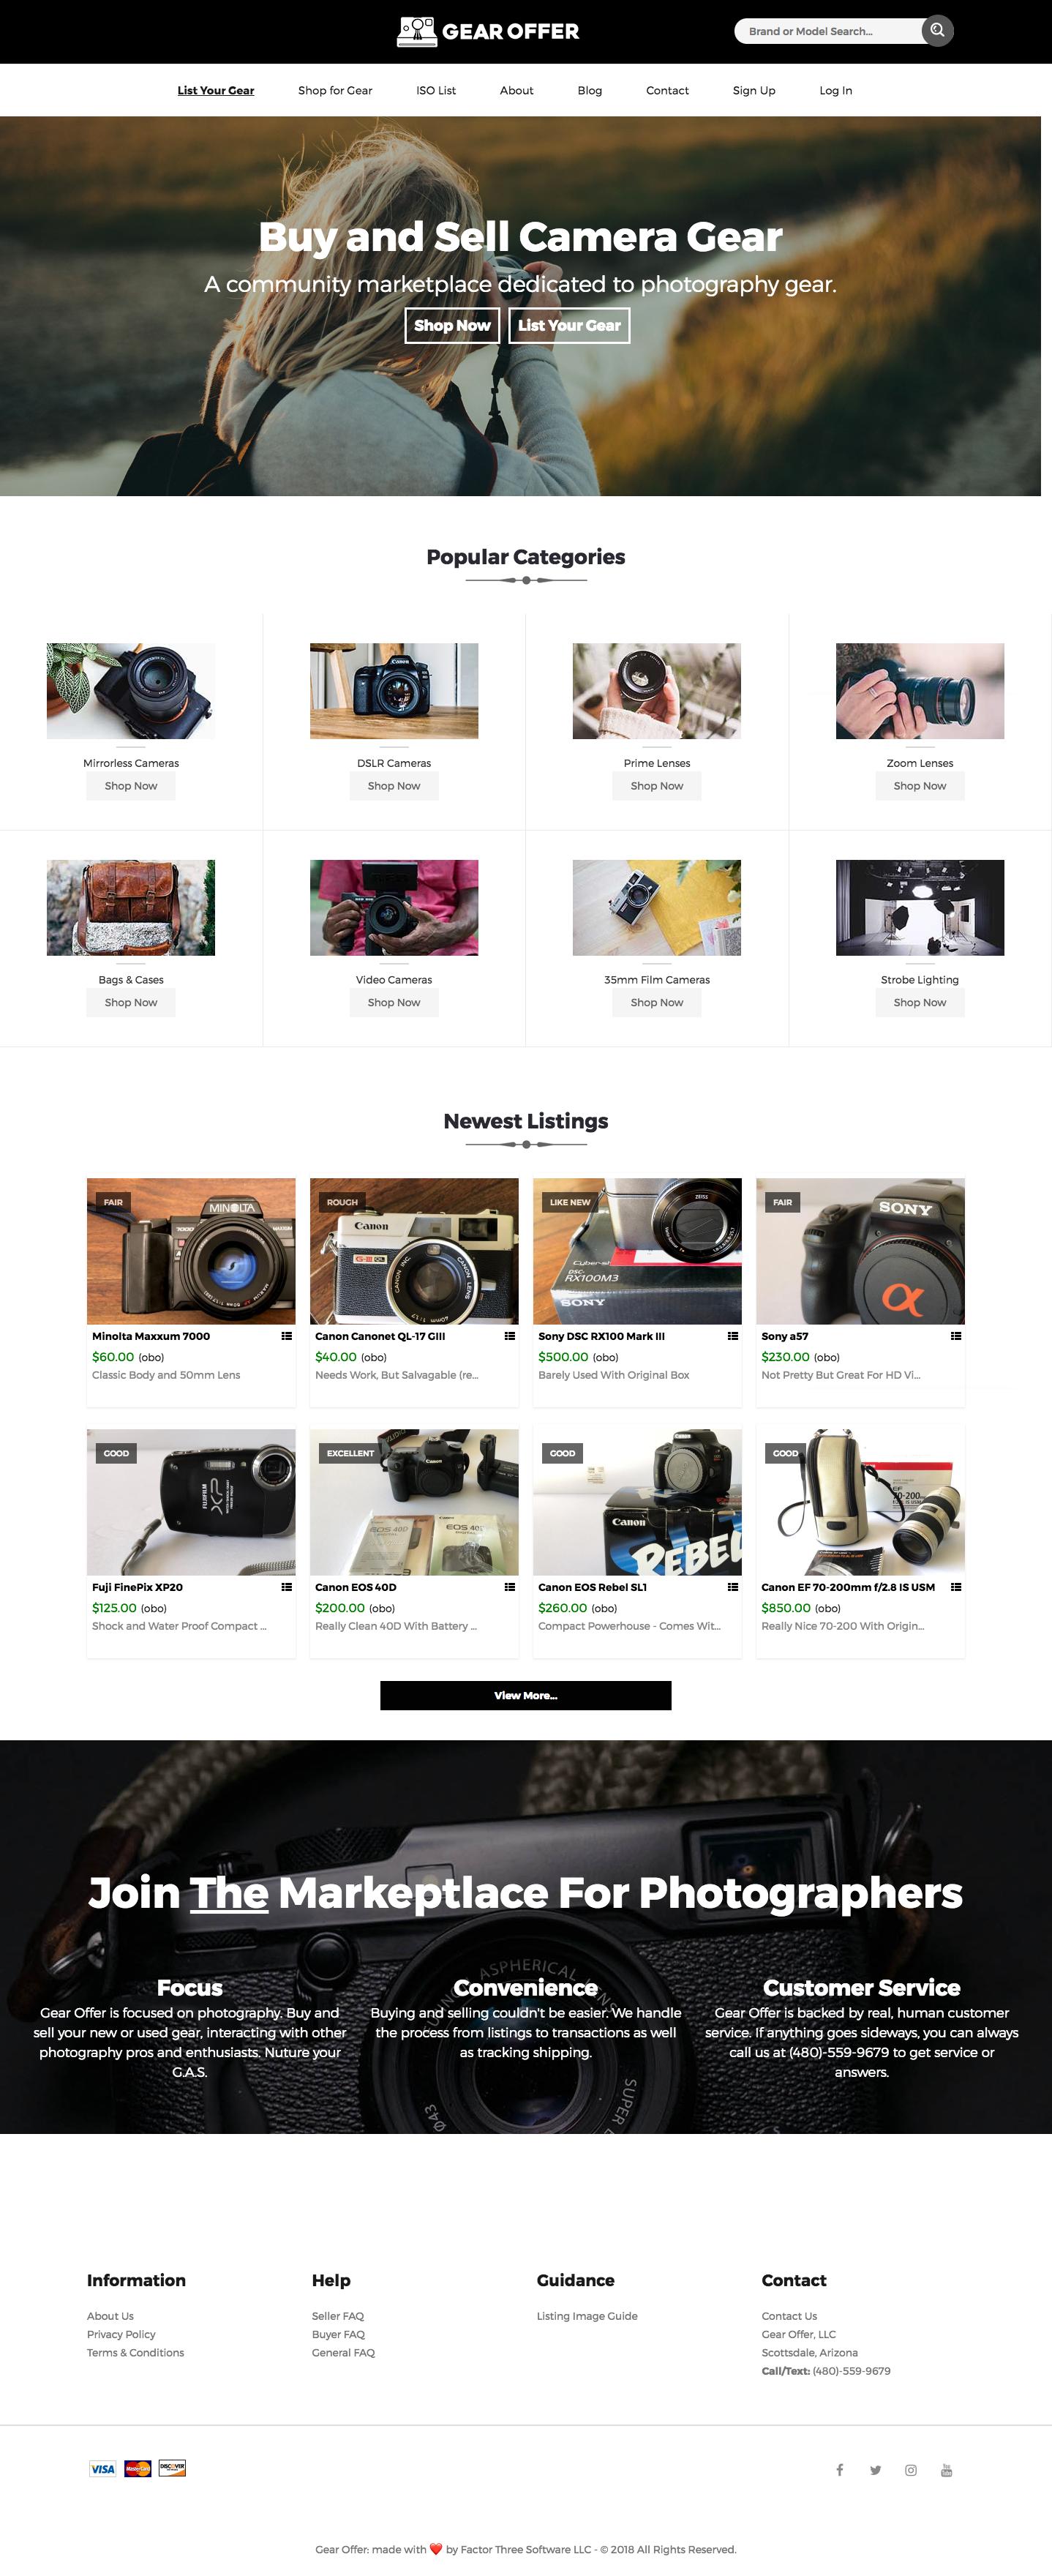 GearOffer.com